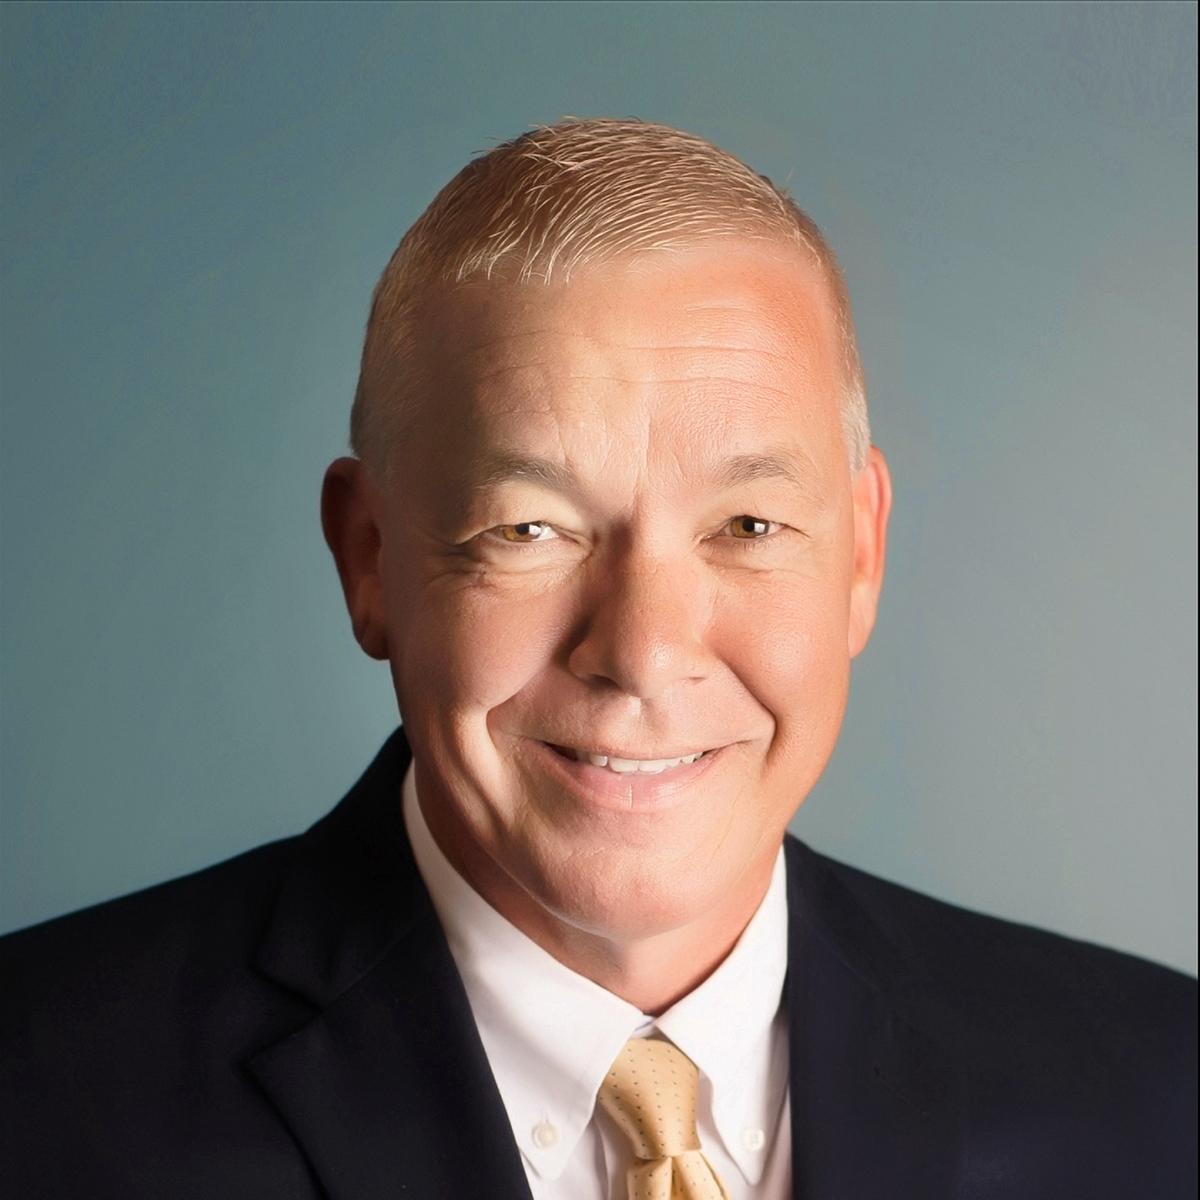 Dr. Bradley C. Landis